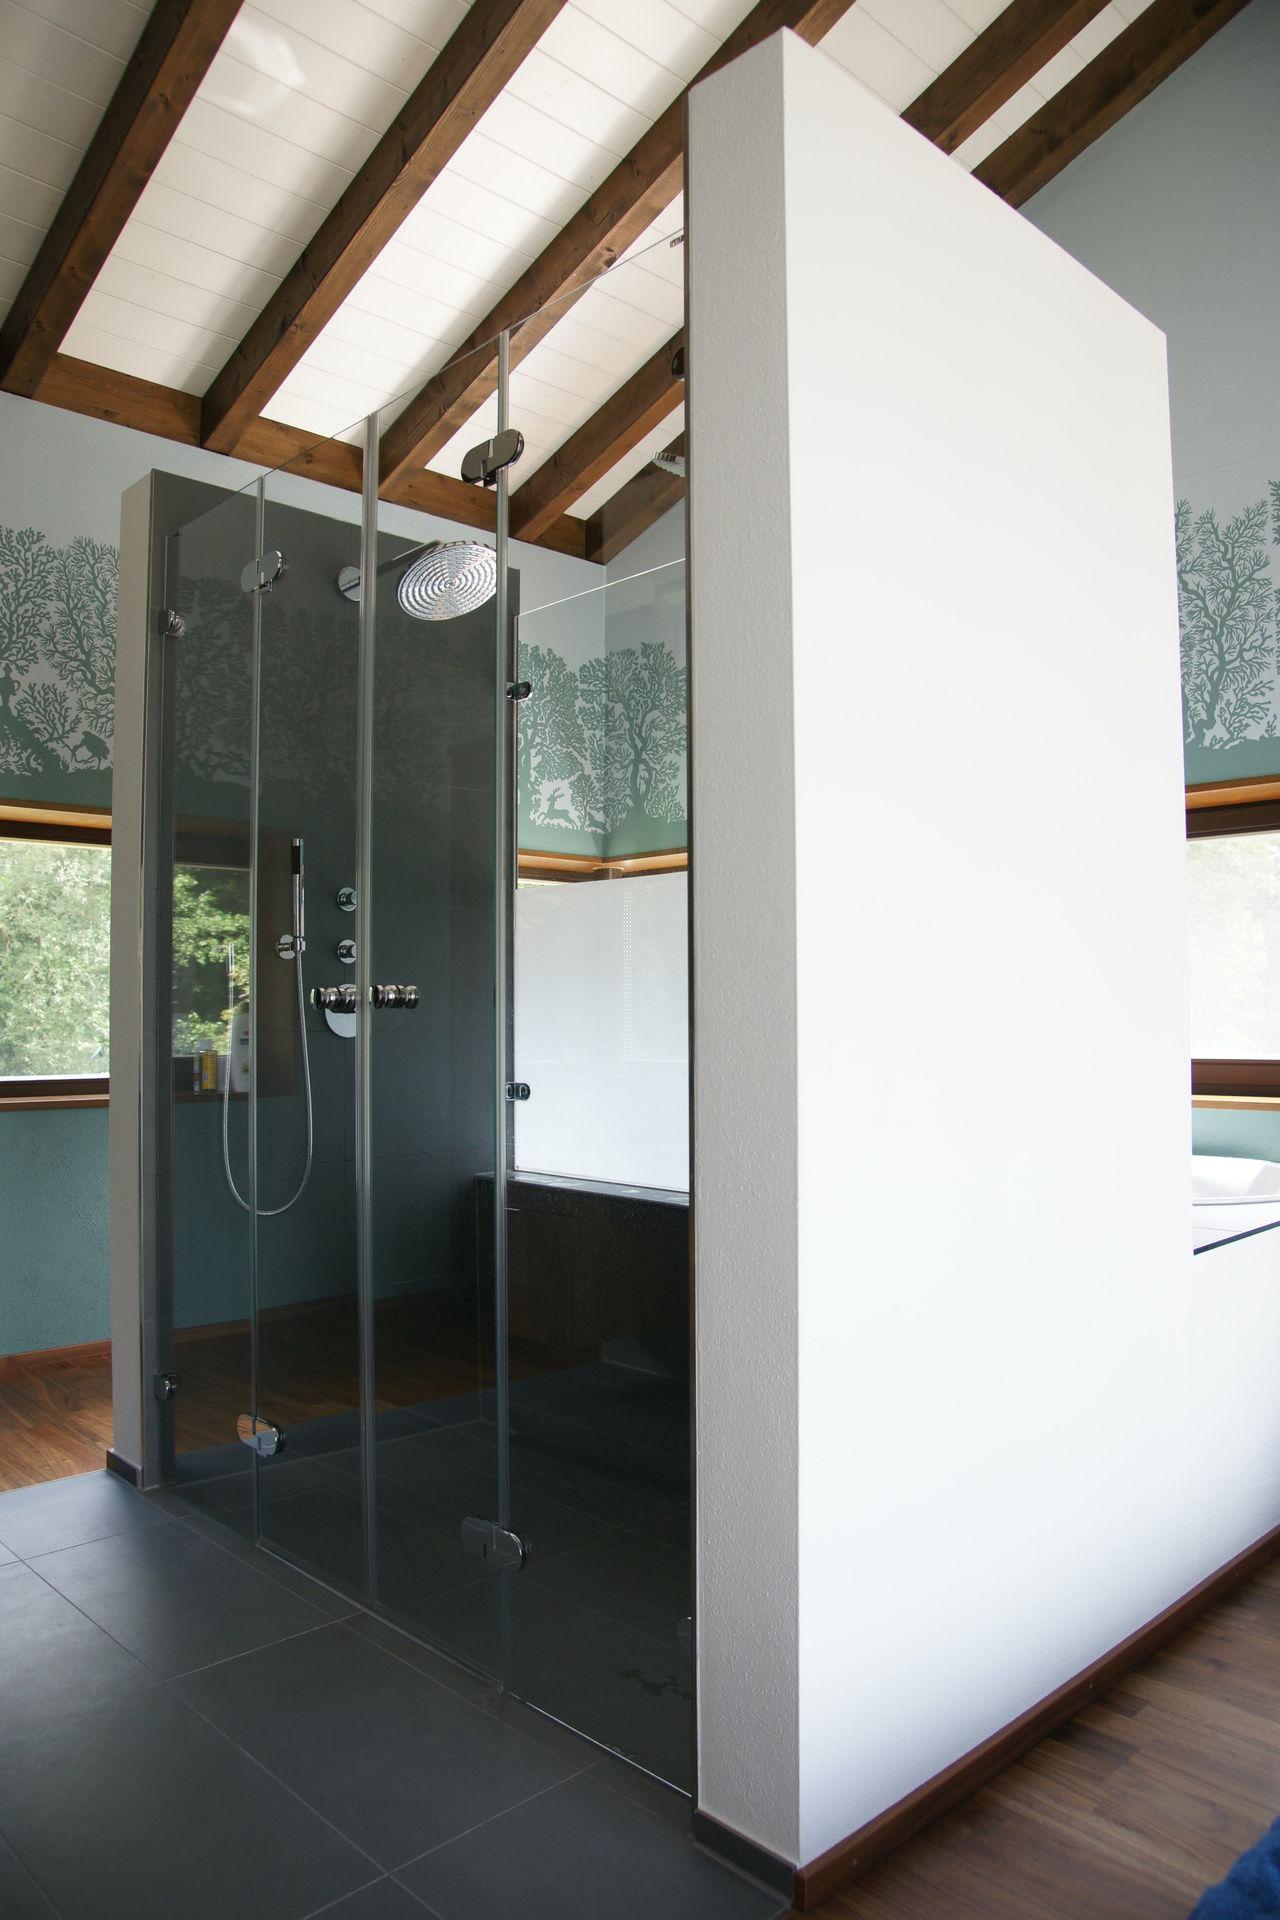 Dusche Unter Dem Dach : Mintgr?nes Bad unter dem Dach – bauemotion.de